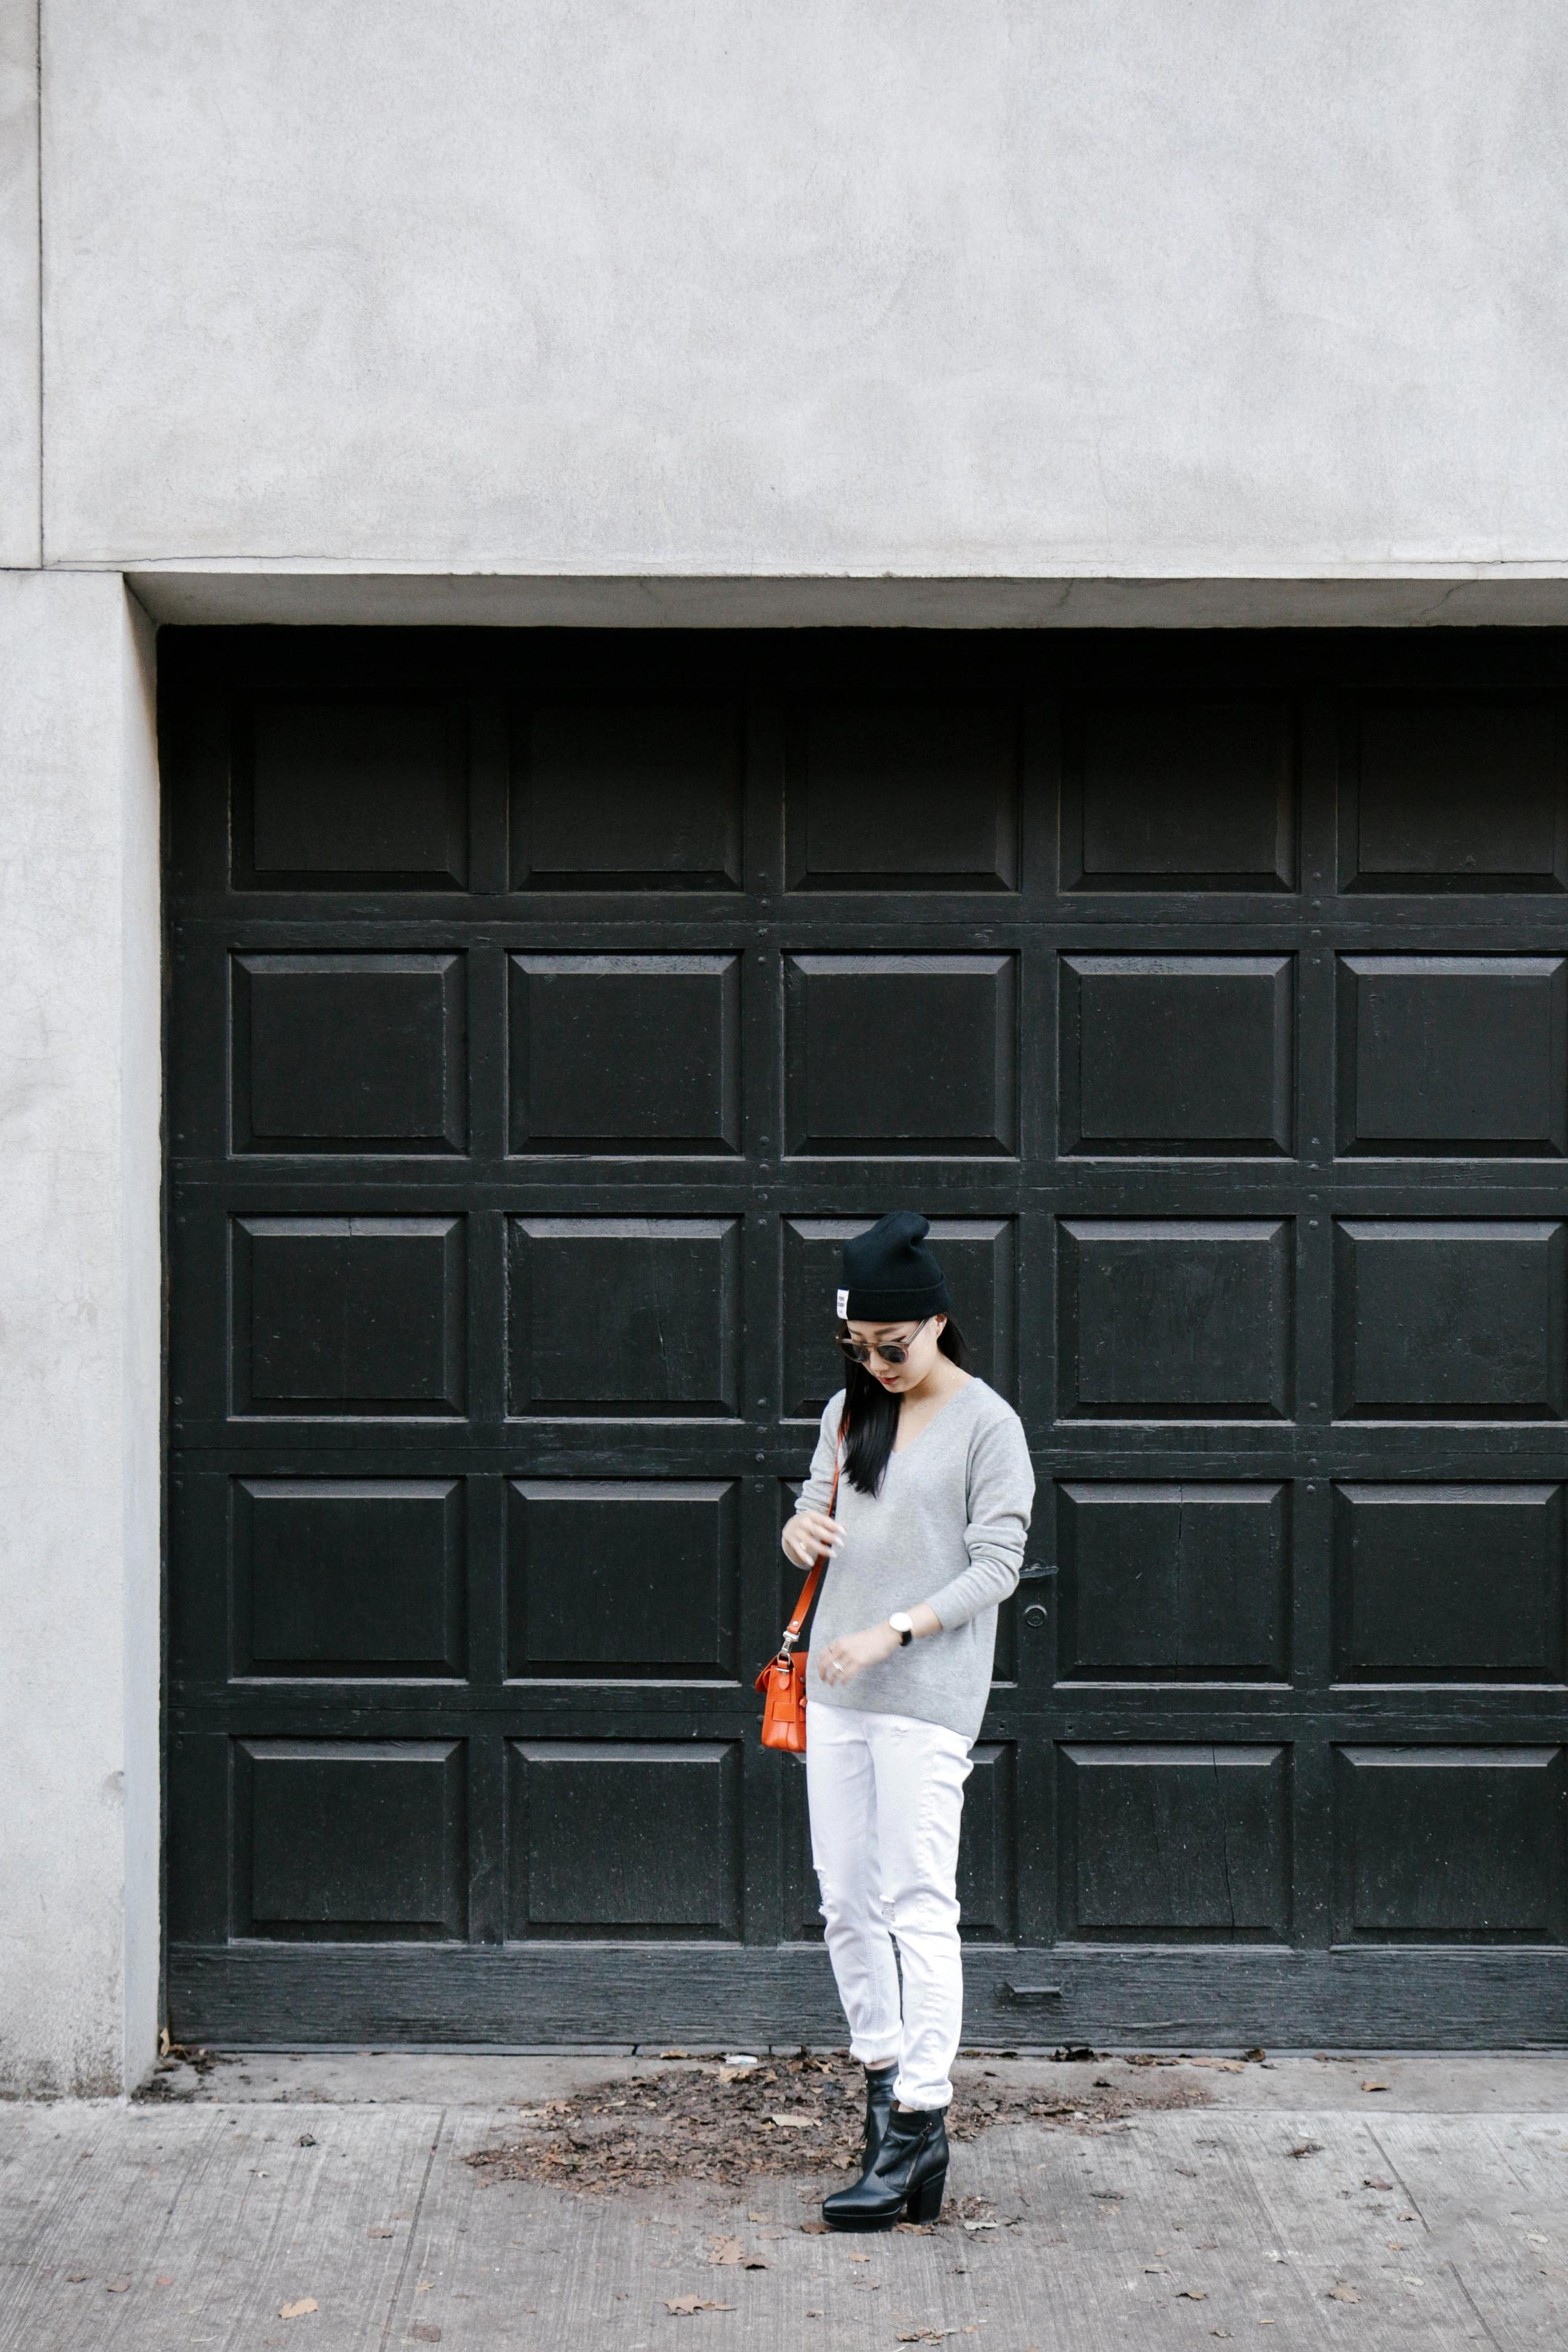 Stella McCartney Coat ,  Everlane Sweater , Rag & Bone Jeans,  Acne Studios Boots , Proenza Schouler Bag ( in Black ),  COS Scarf ,  Cutler and Gross Sunglasses ,  Opening Ceremony Beanie ,  Daniel Wellington Watch ,  AVEC New York Ring ,  Catbird Rings